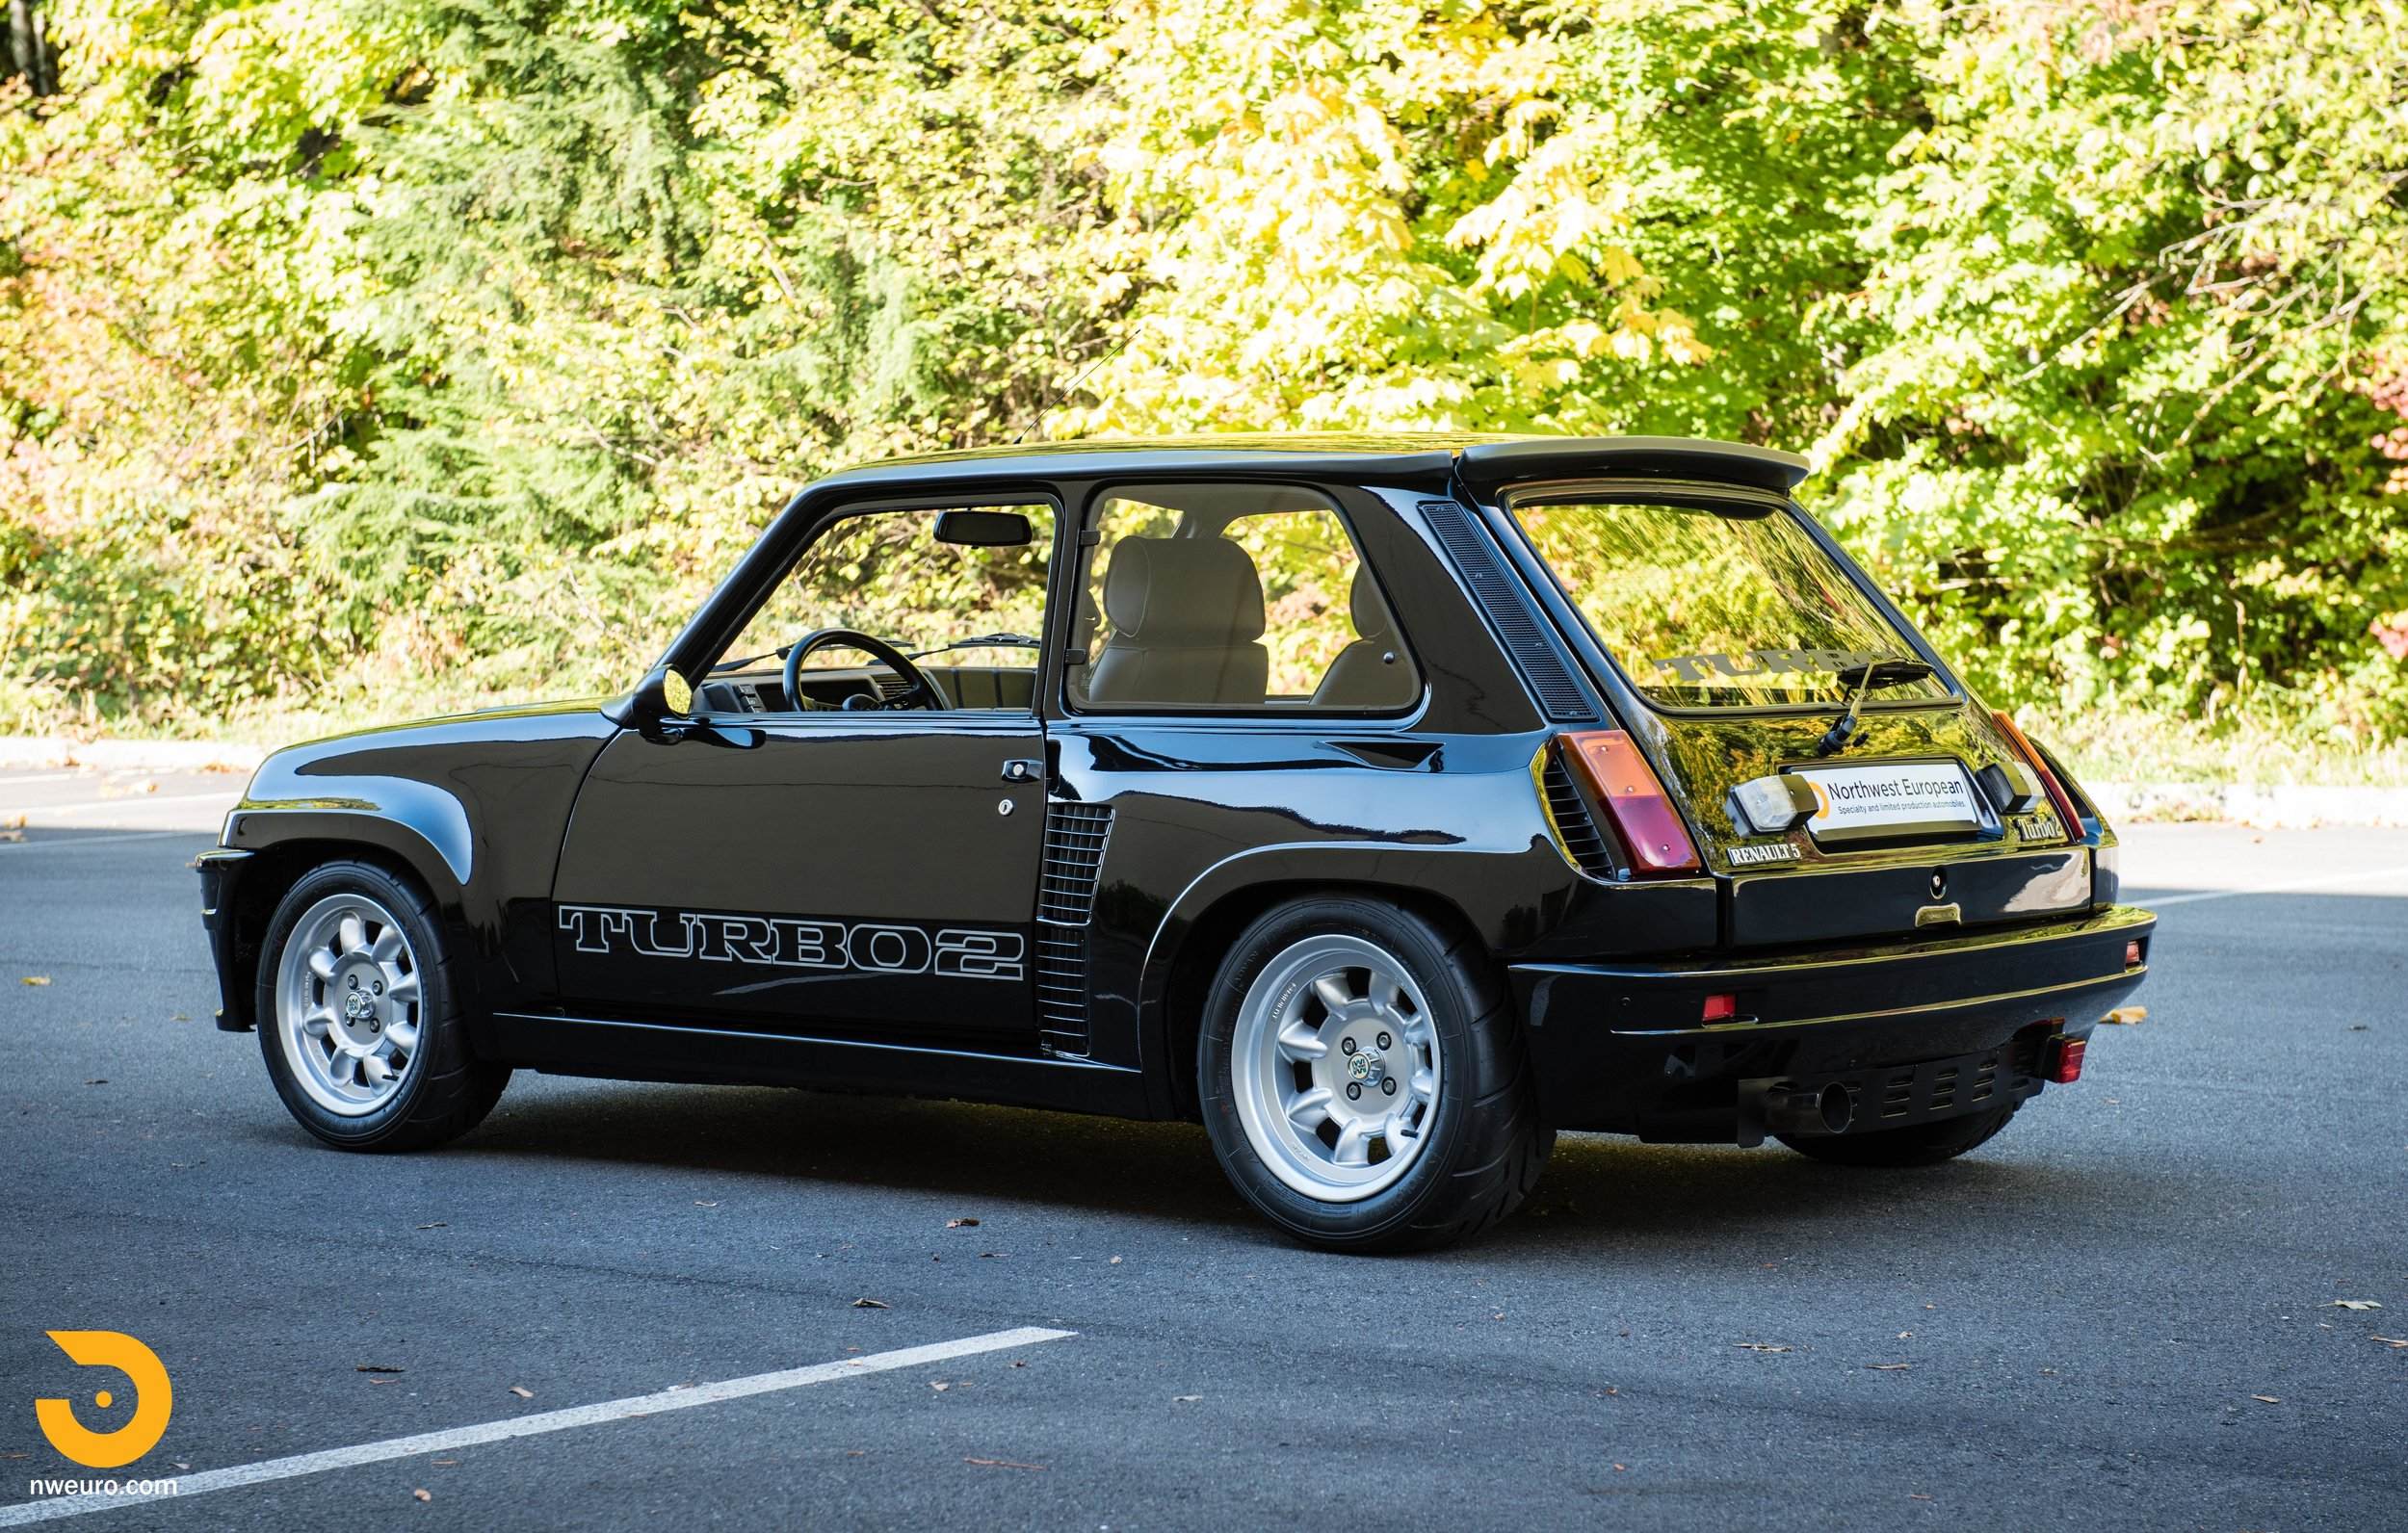 1983 Renault R5 Turbo 2 Black-49.jpg